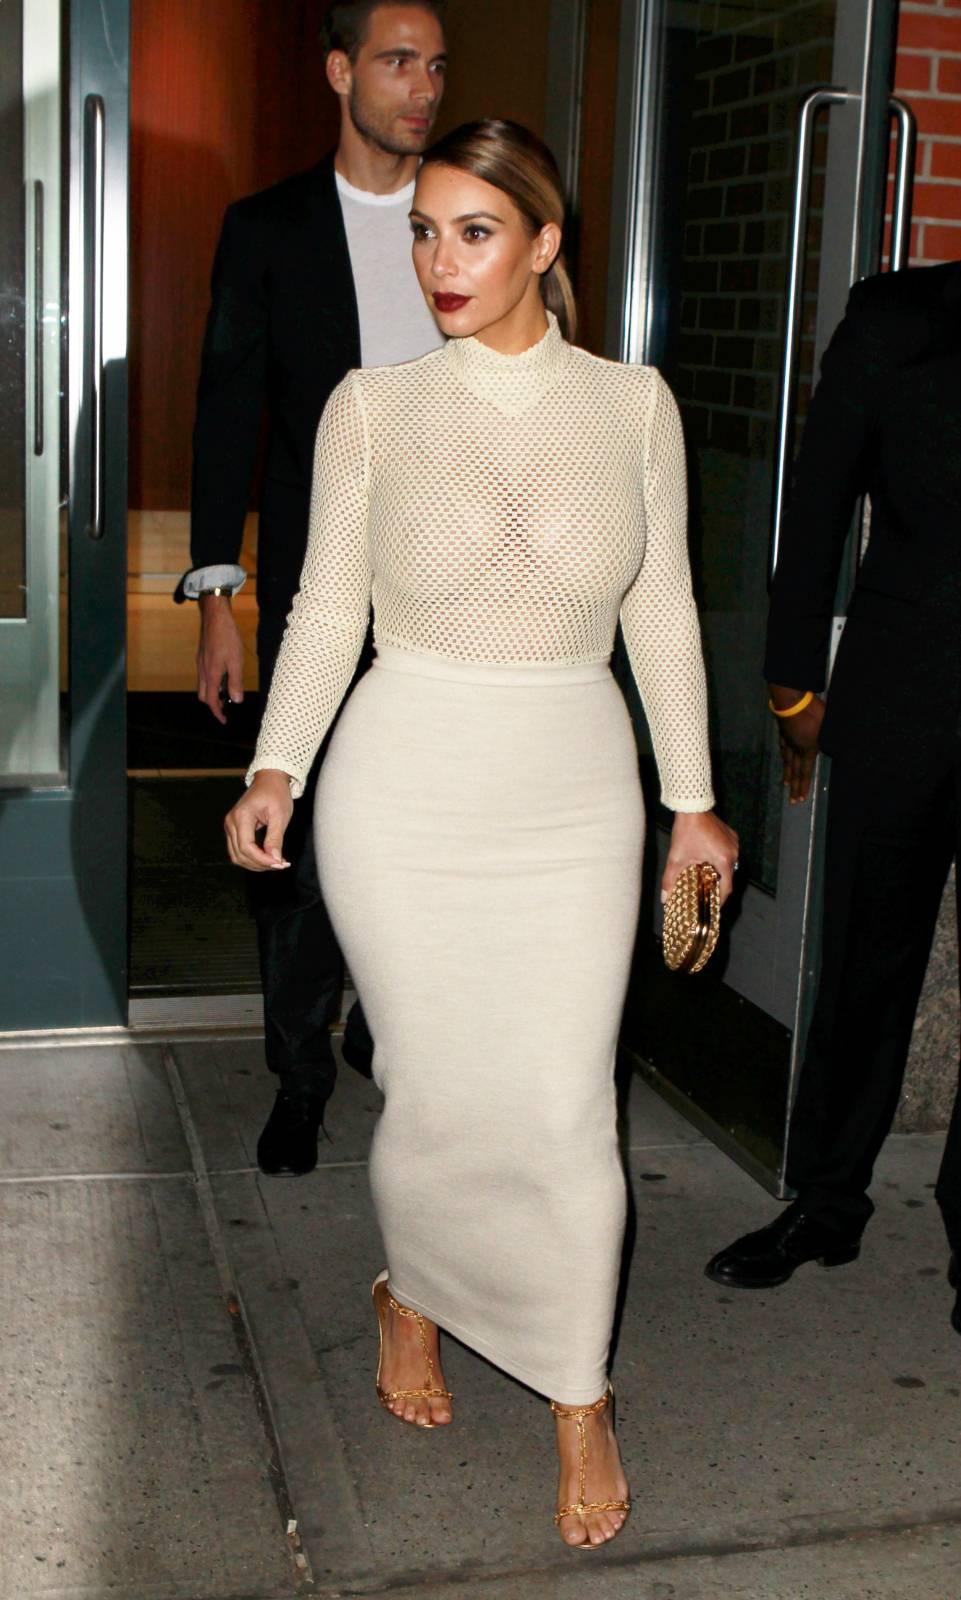 904203398_Kim_Kardashian_191113_ReSiDuO3_123_370lo.jpg